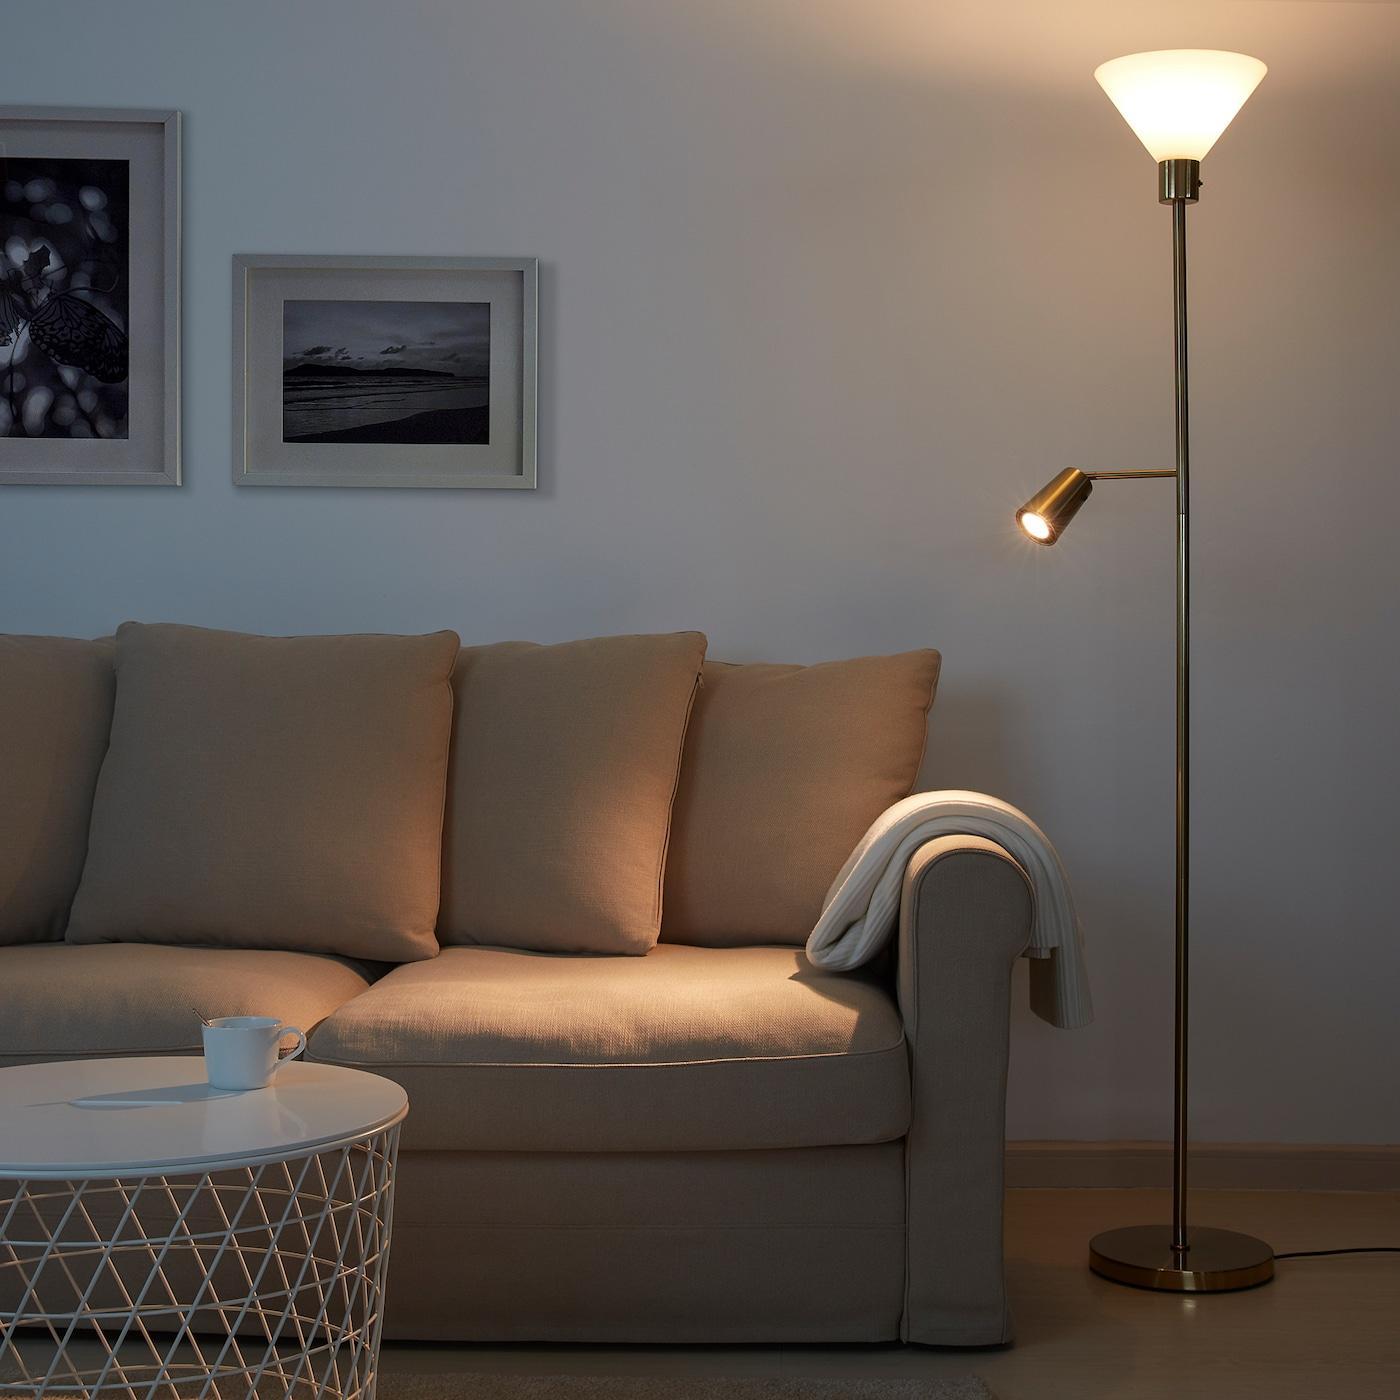 Picture of: Flugbo Gulvluplight Laeselampe Messingfarvet Glas Ikea